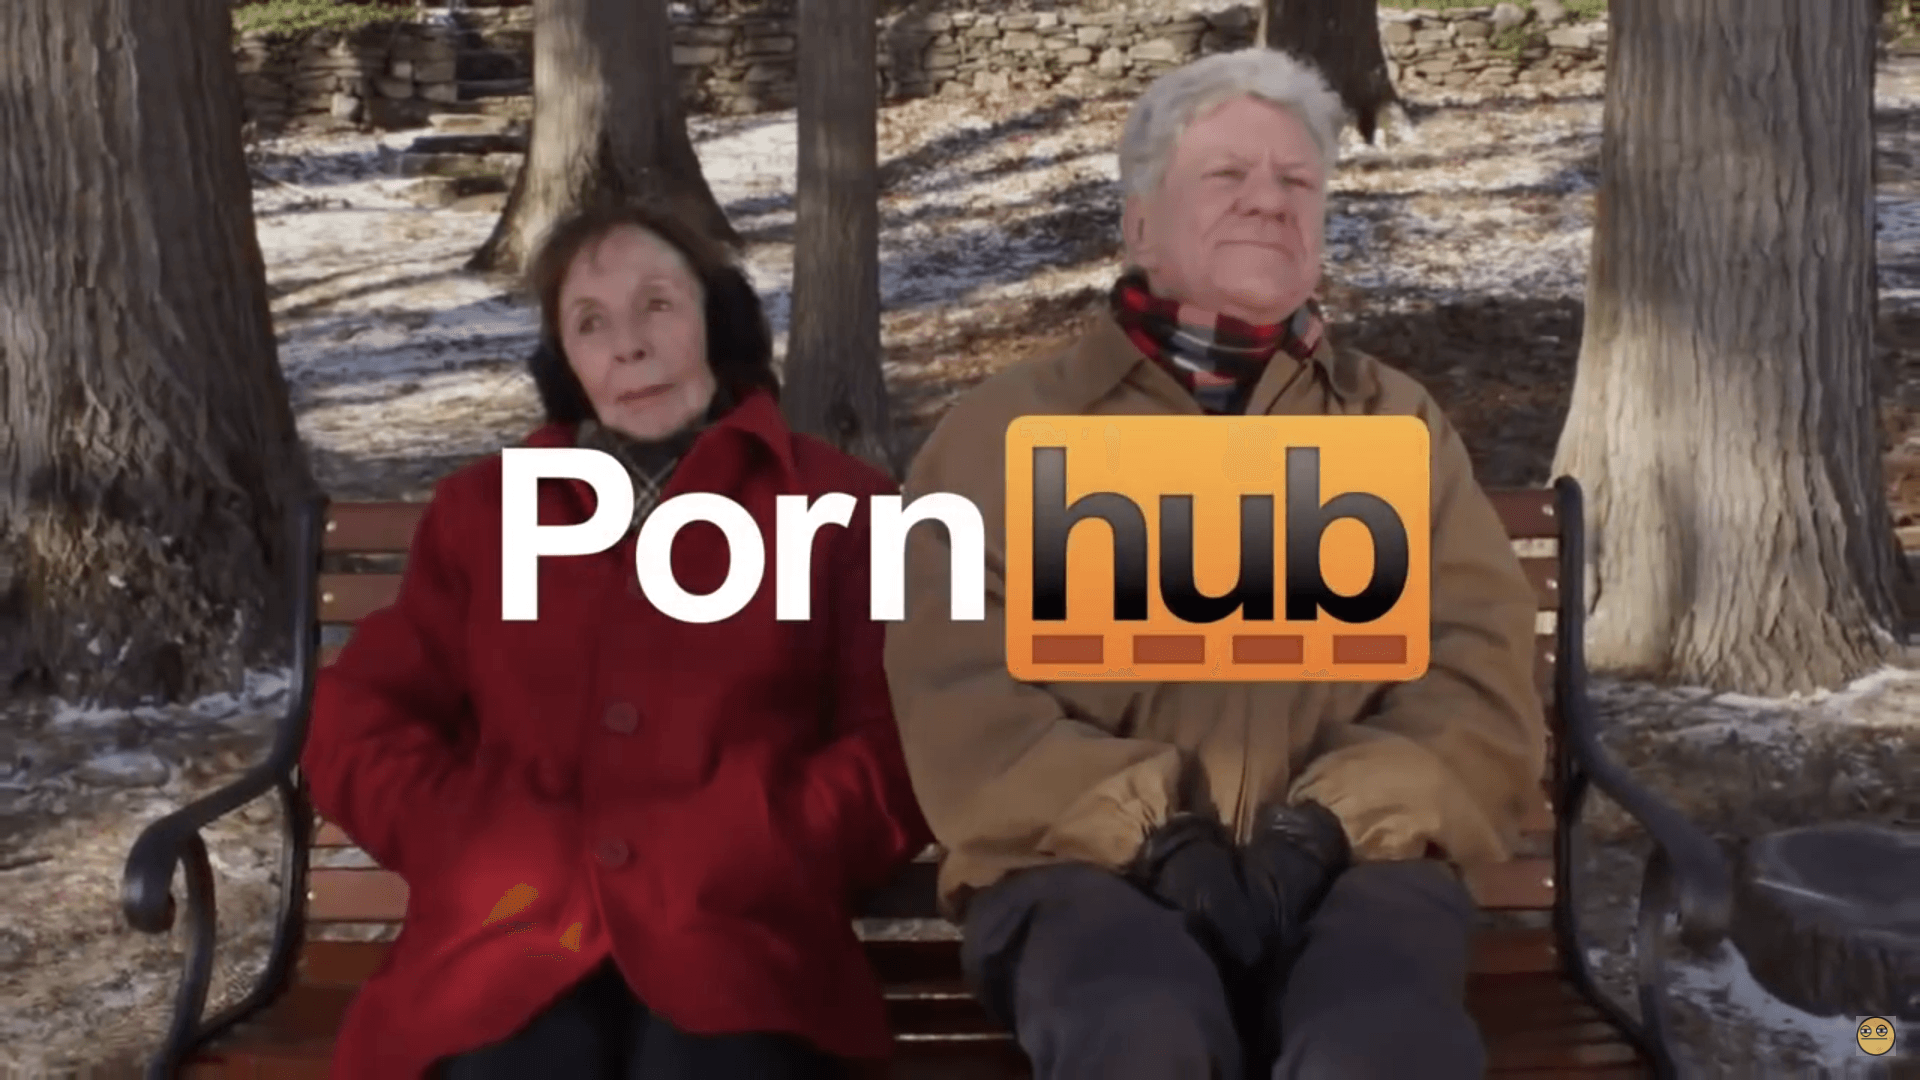 Pornhub commercial